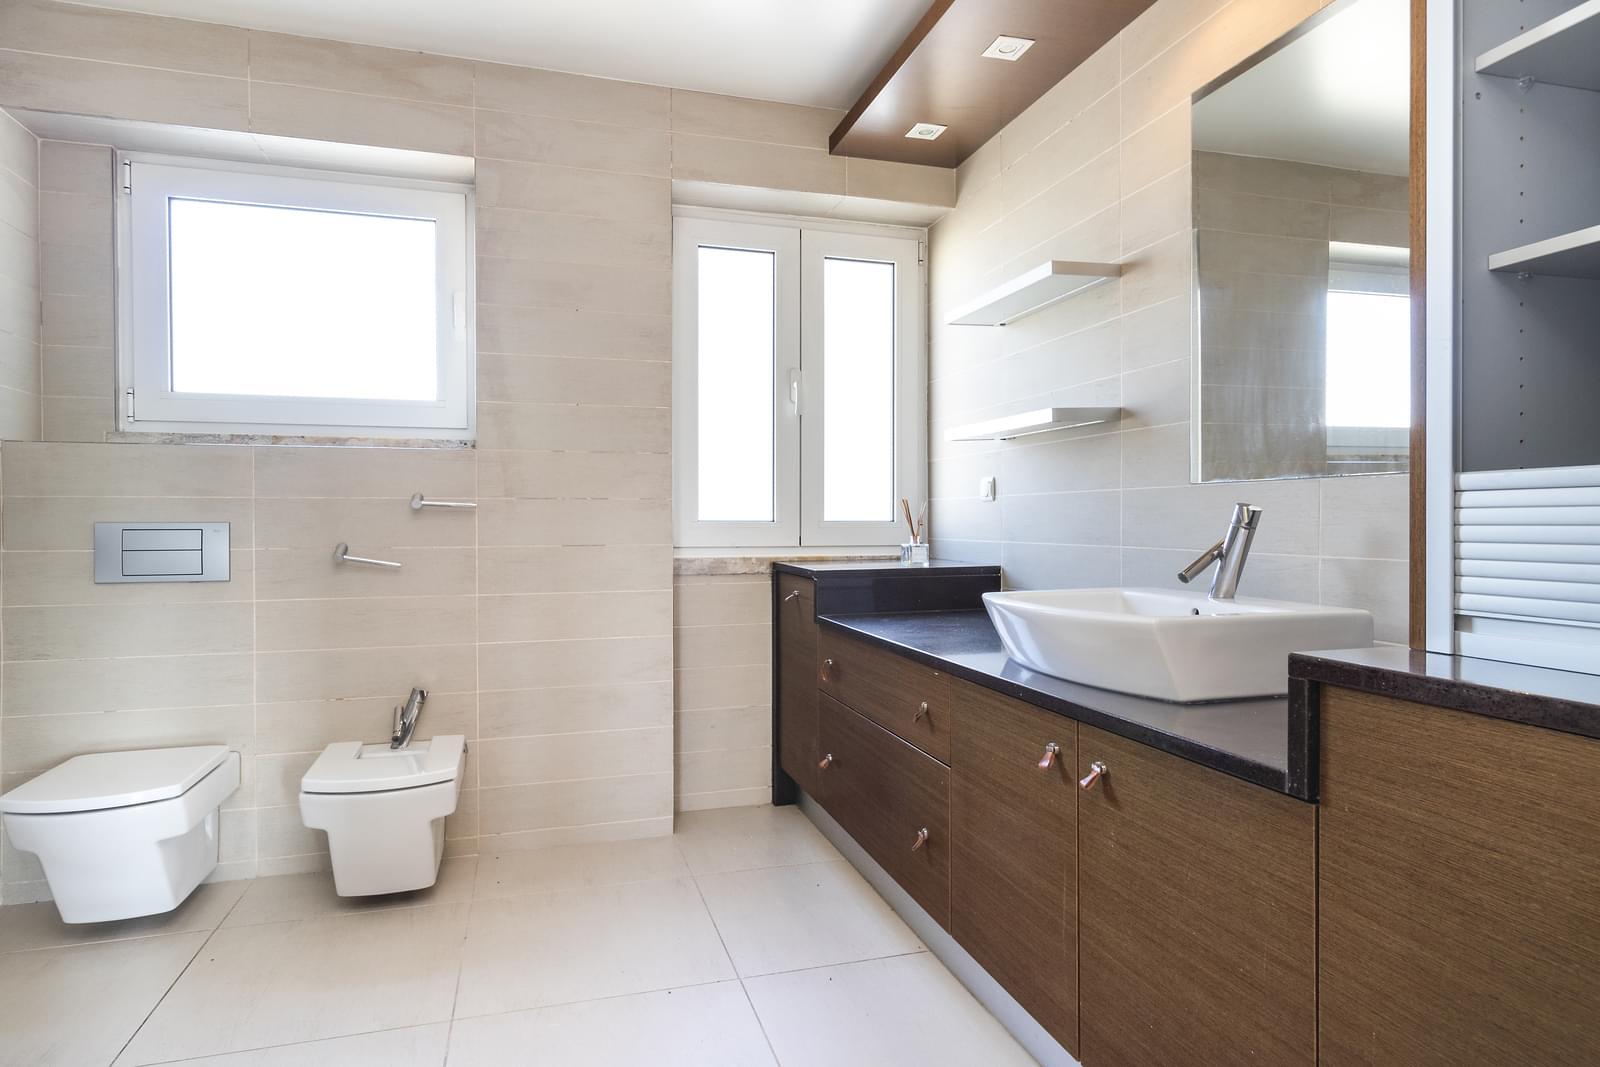 PF21851, Apartamento T3 + 1, Lisboa